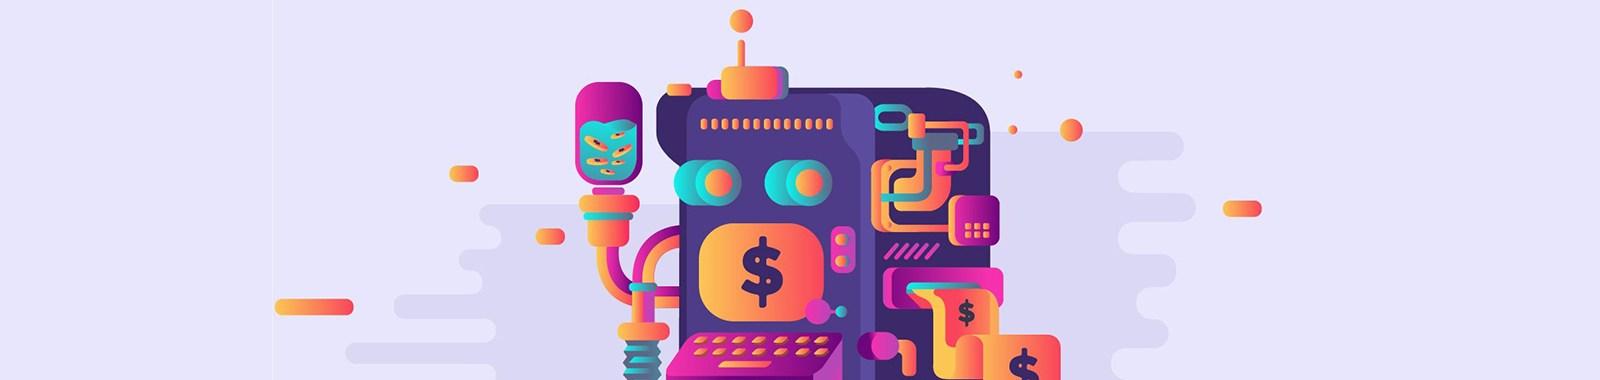 robot-and-money-eye_adtech